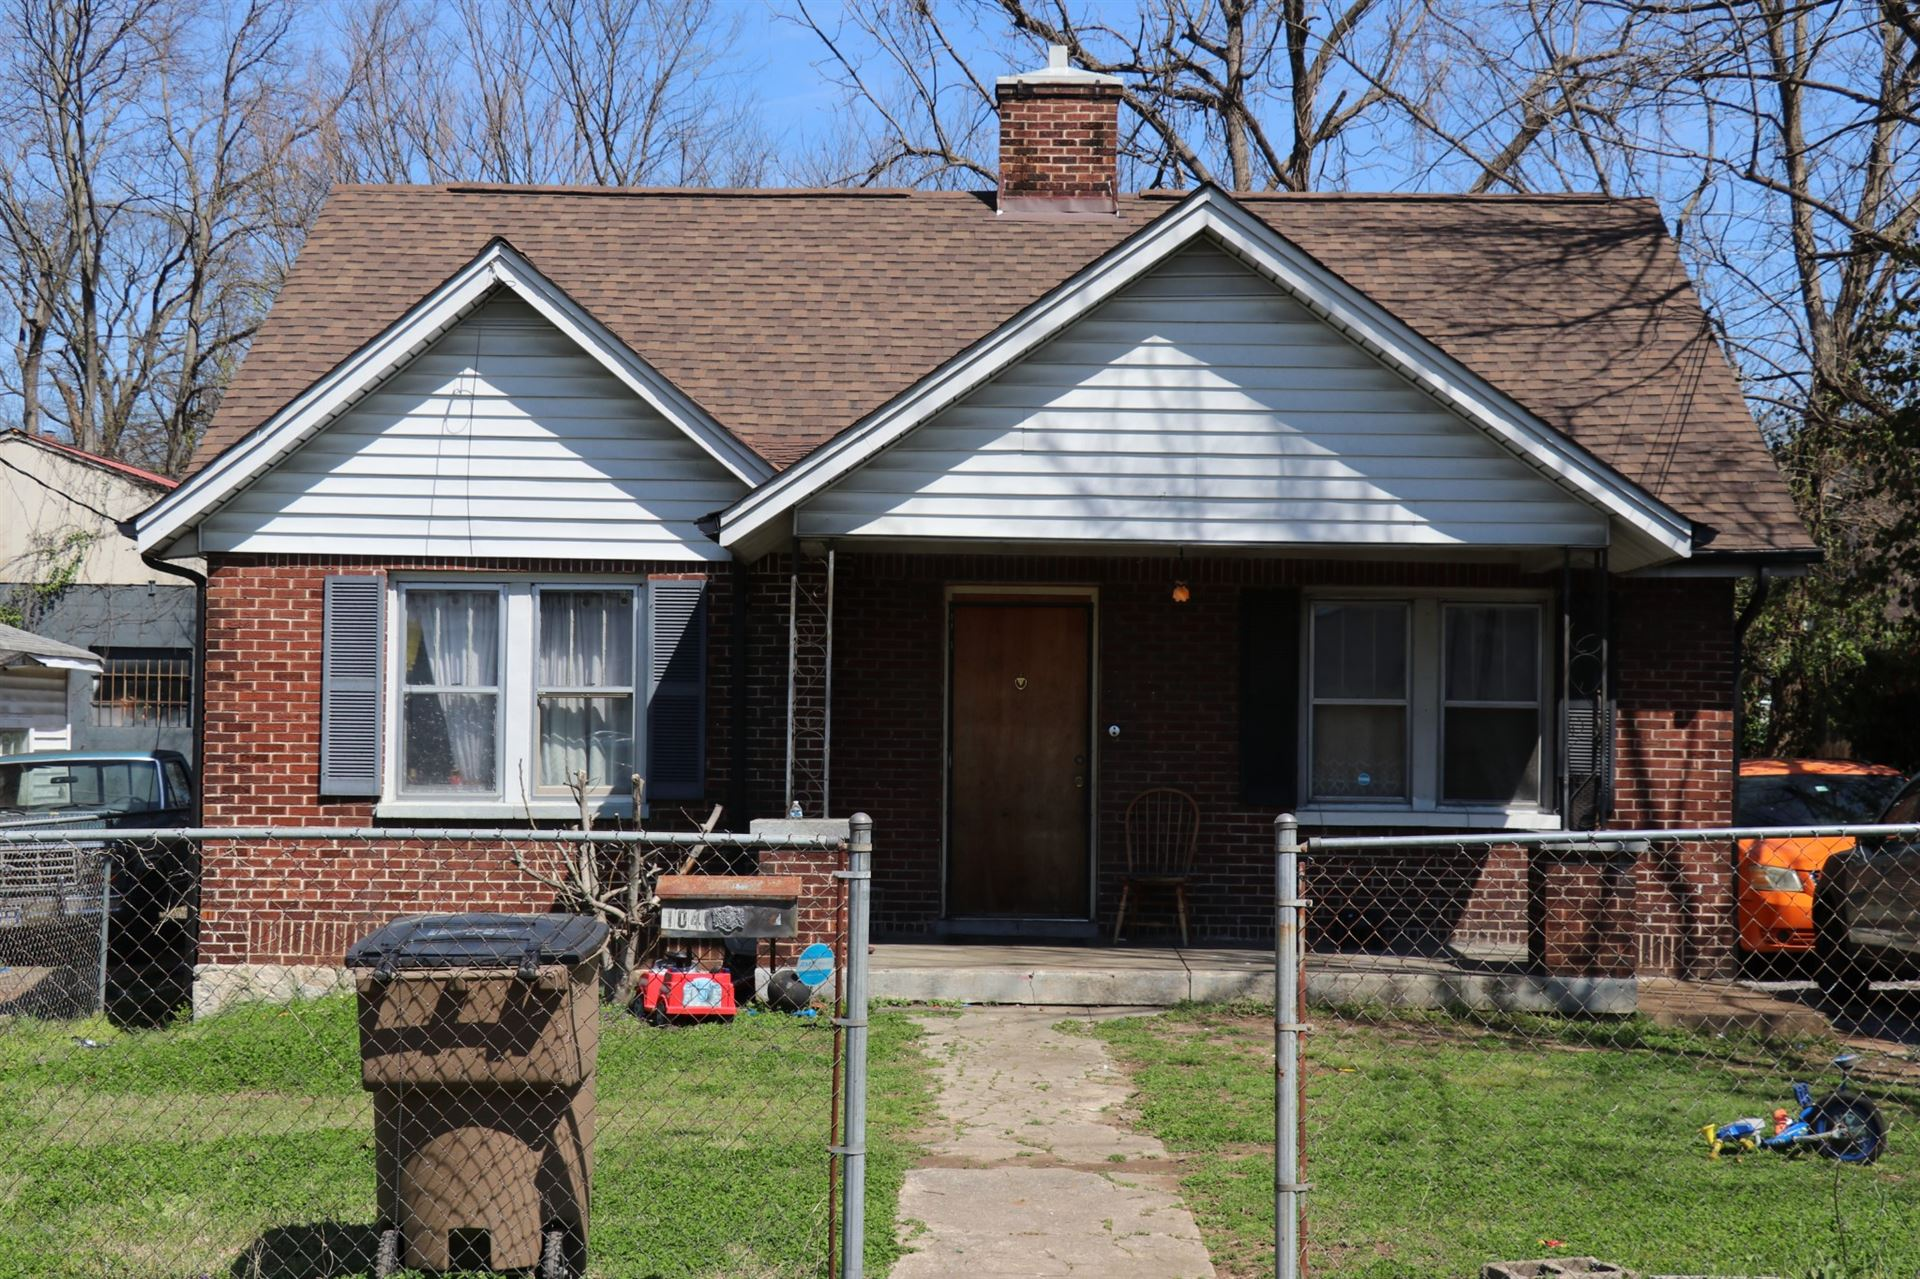 1049 Sharpe Ave, Nashville, TN 37206 - MLS#: 2244443